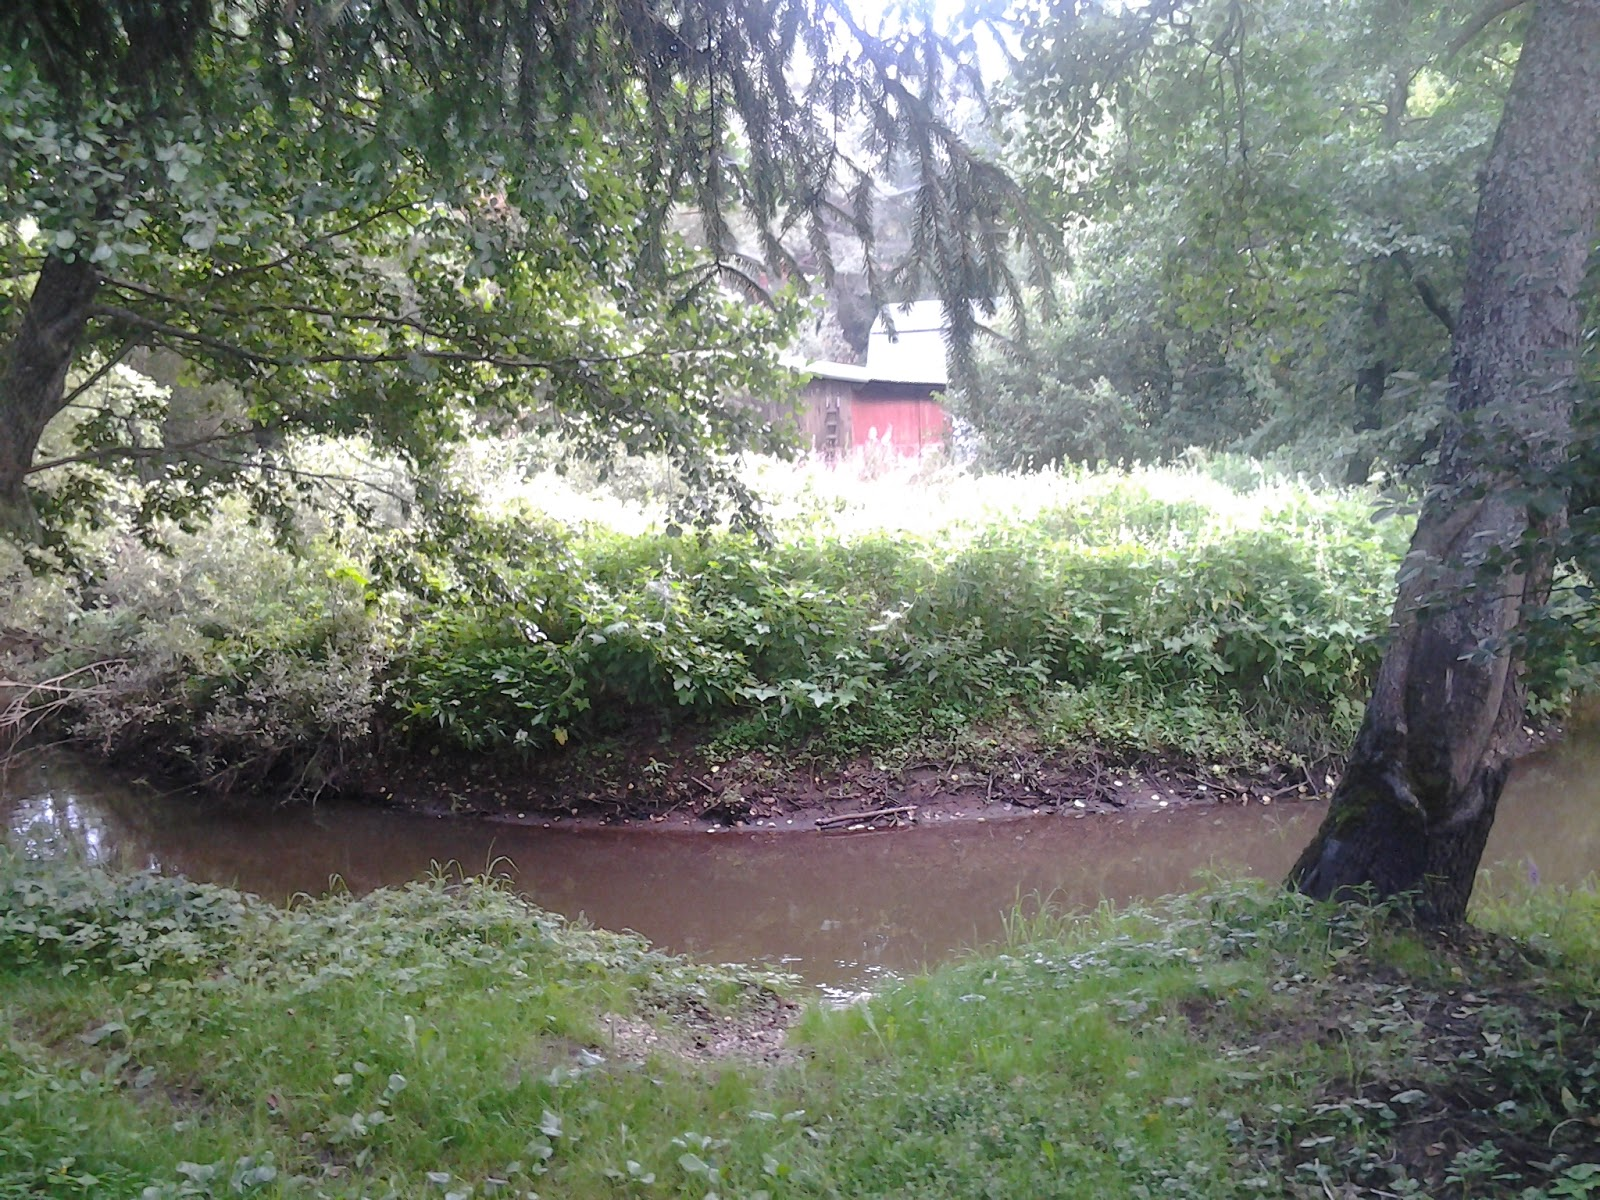 Дача на берегу реки с стромынь снт